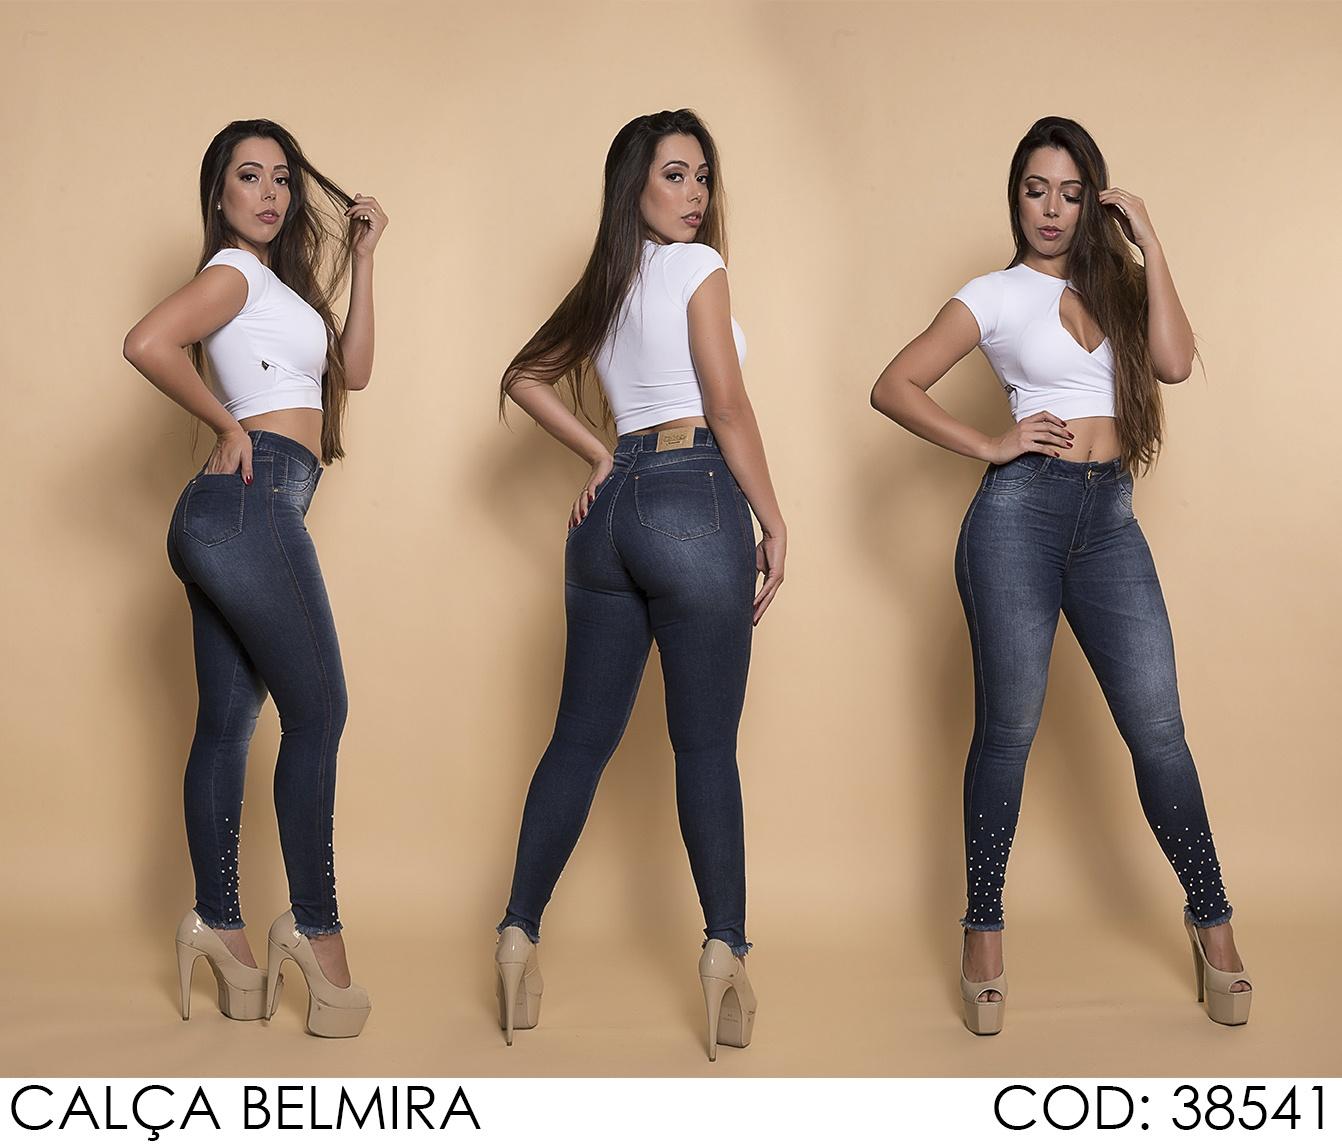 Calça Darlook Belmira [38541]